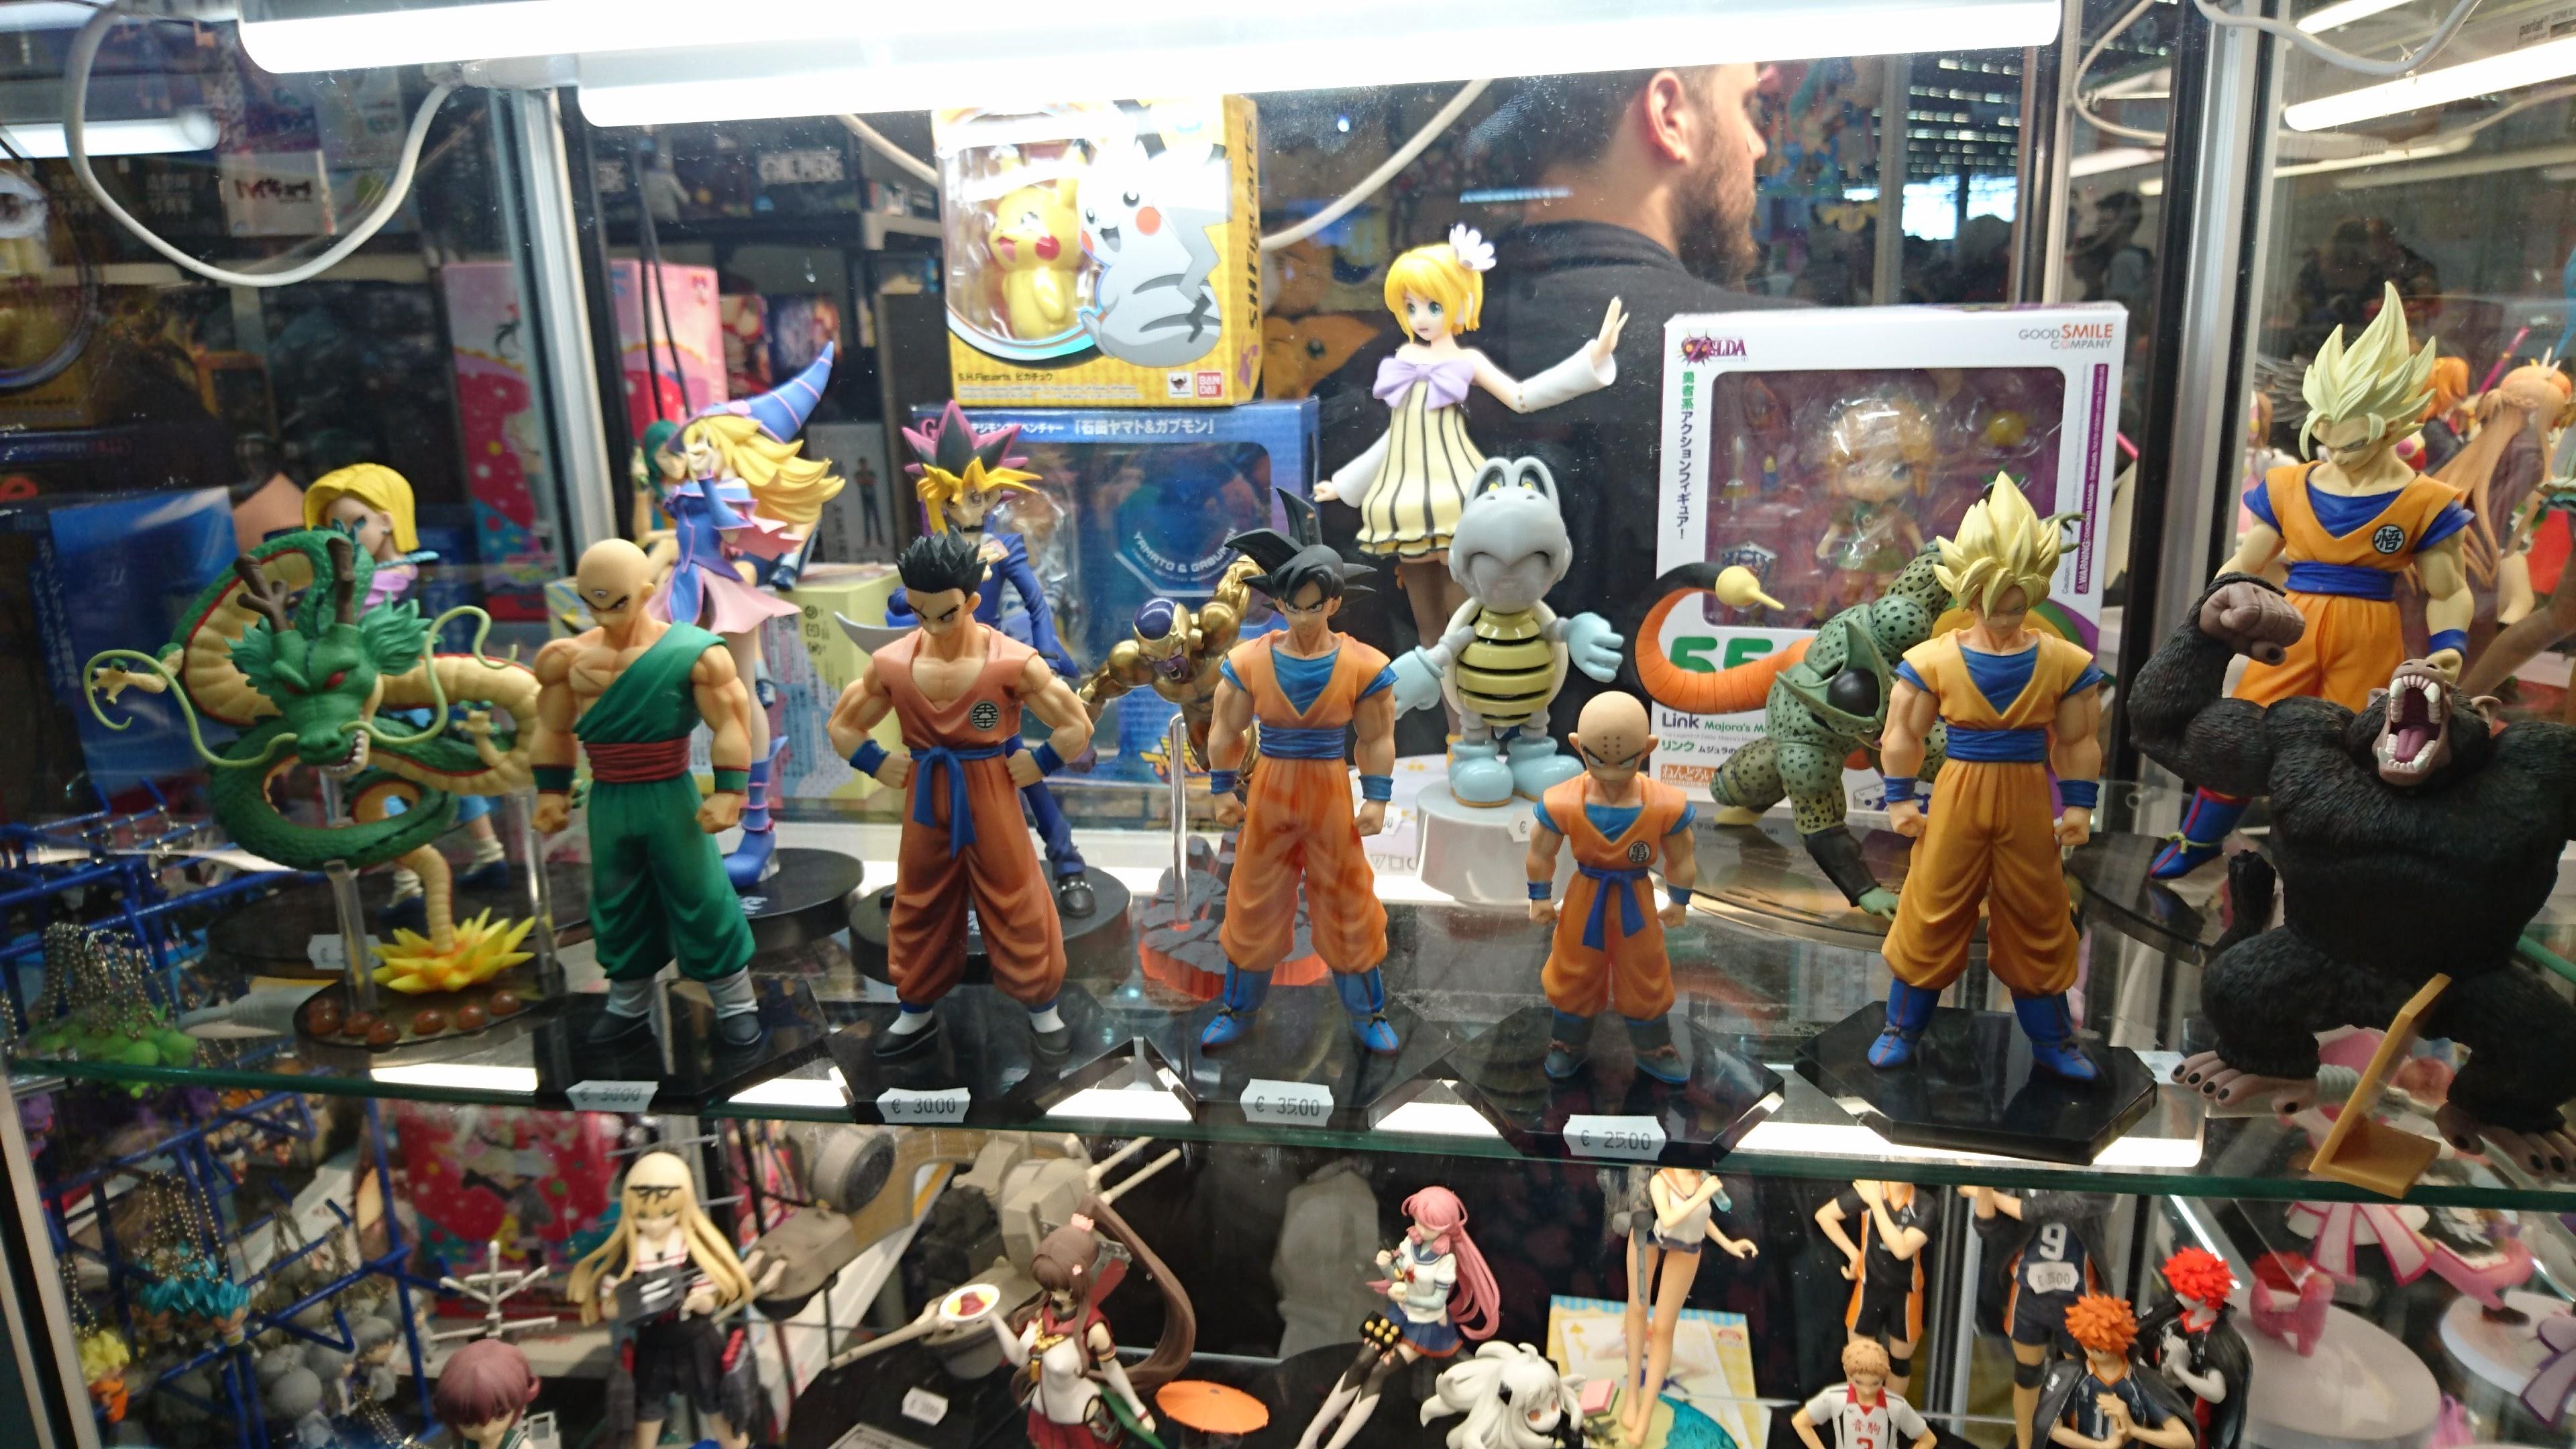 http://matcha-et-sakura.com/wp-content/uploads/2016/07/Japan-Expo-figurines.jpg